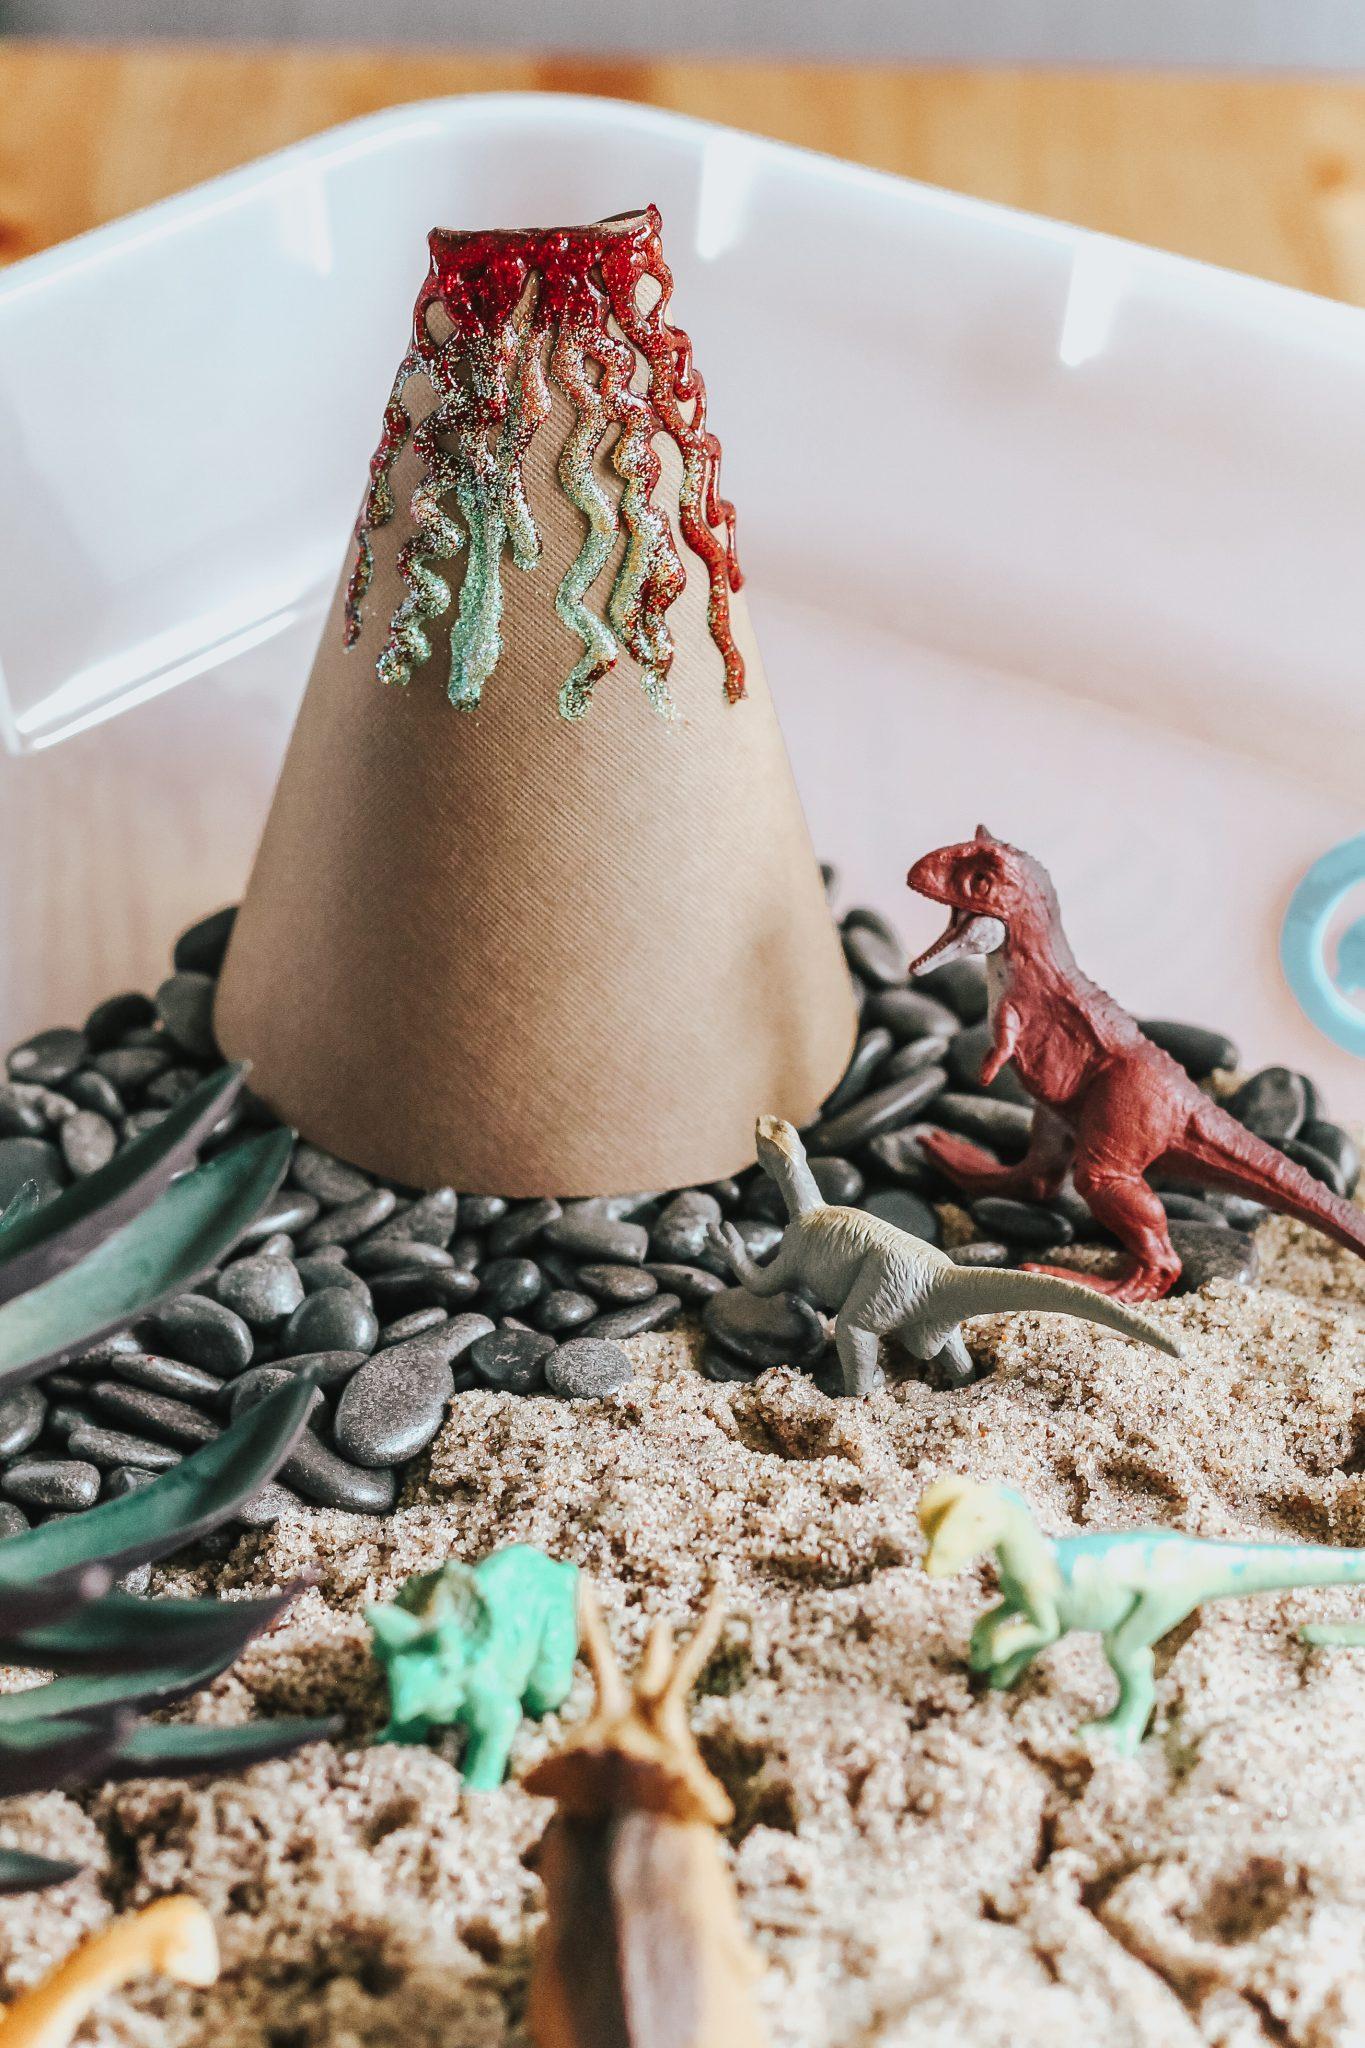 Dinosaur Island Sensory Bin with Kinetic Sand